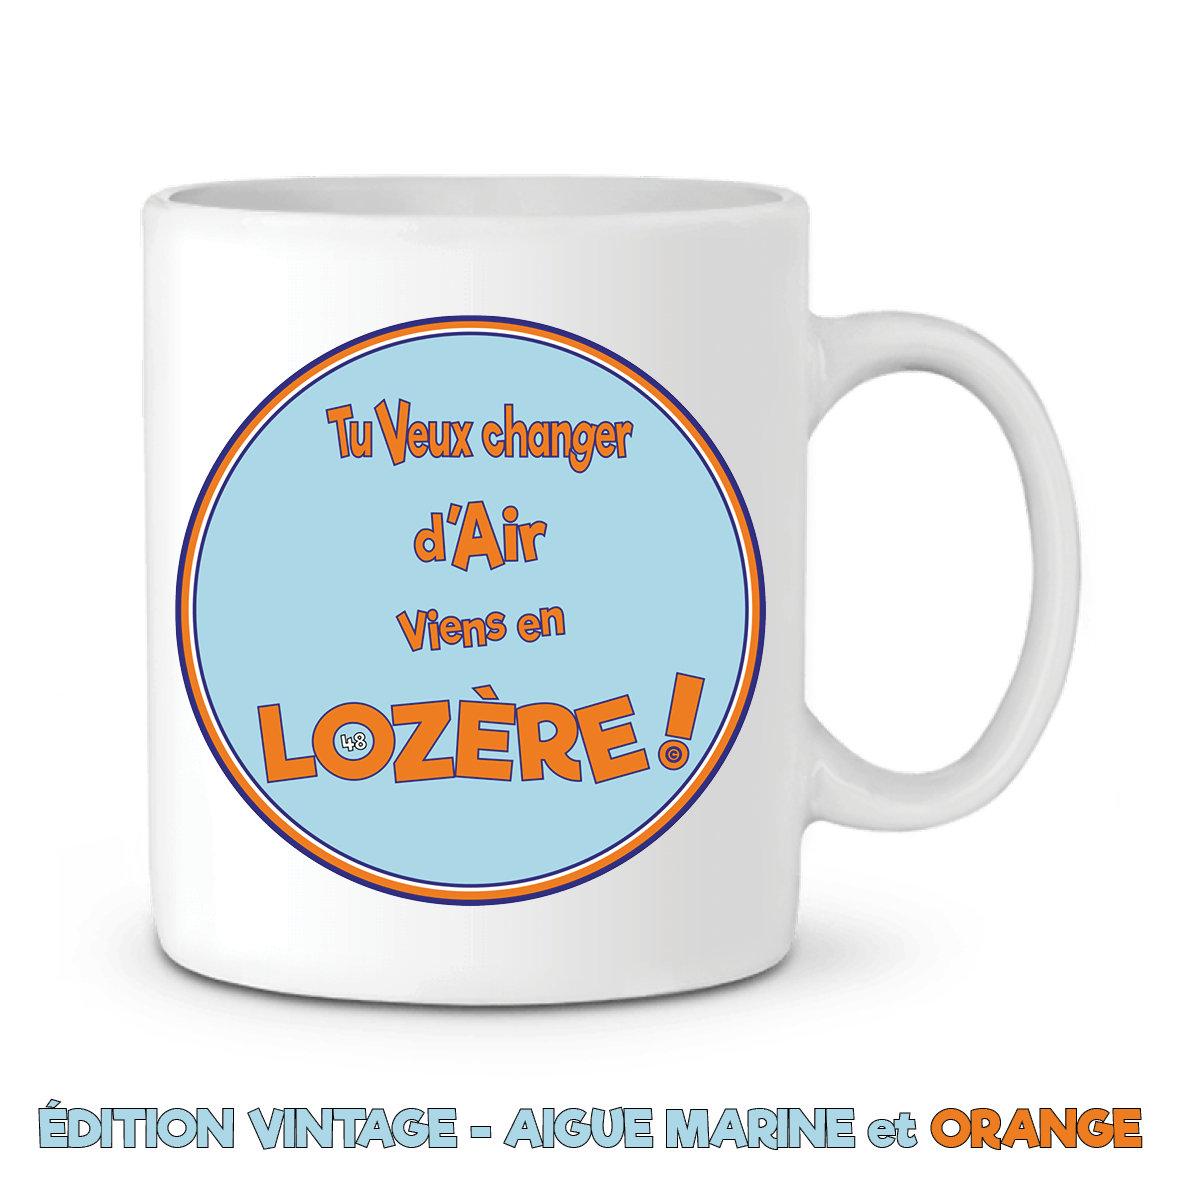 Blanc 48 Céramique Slogan Le Mug Série En LozèreLozere Vintage NwPy0vm8nO